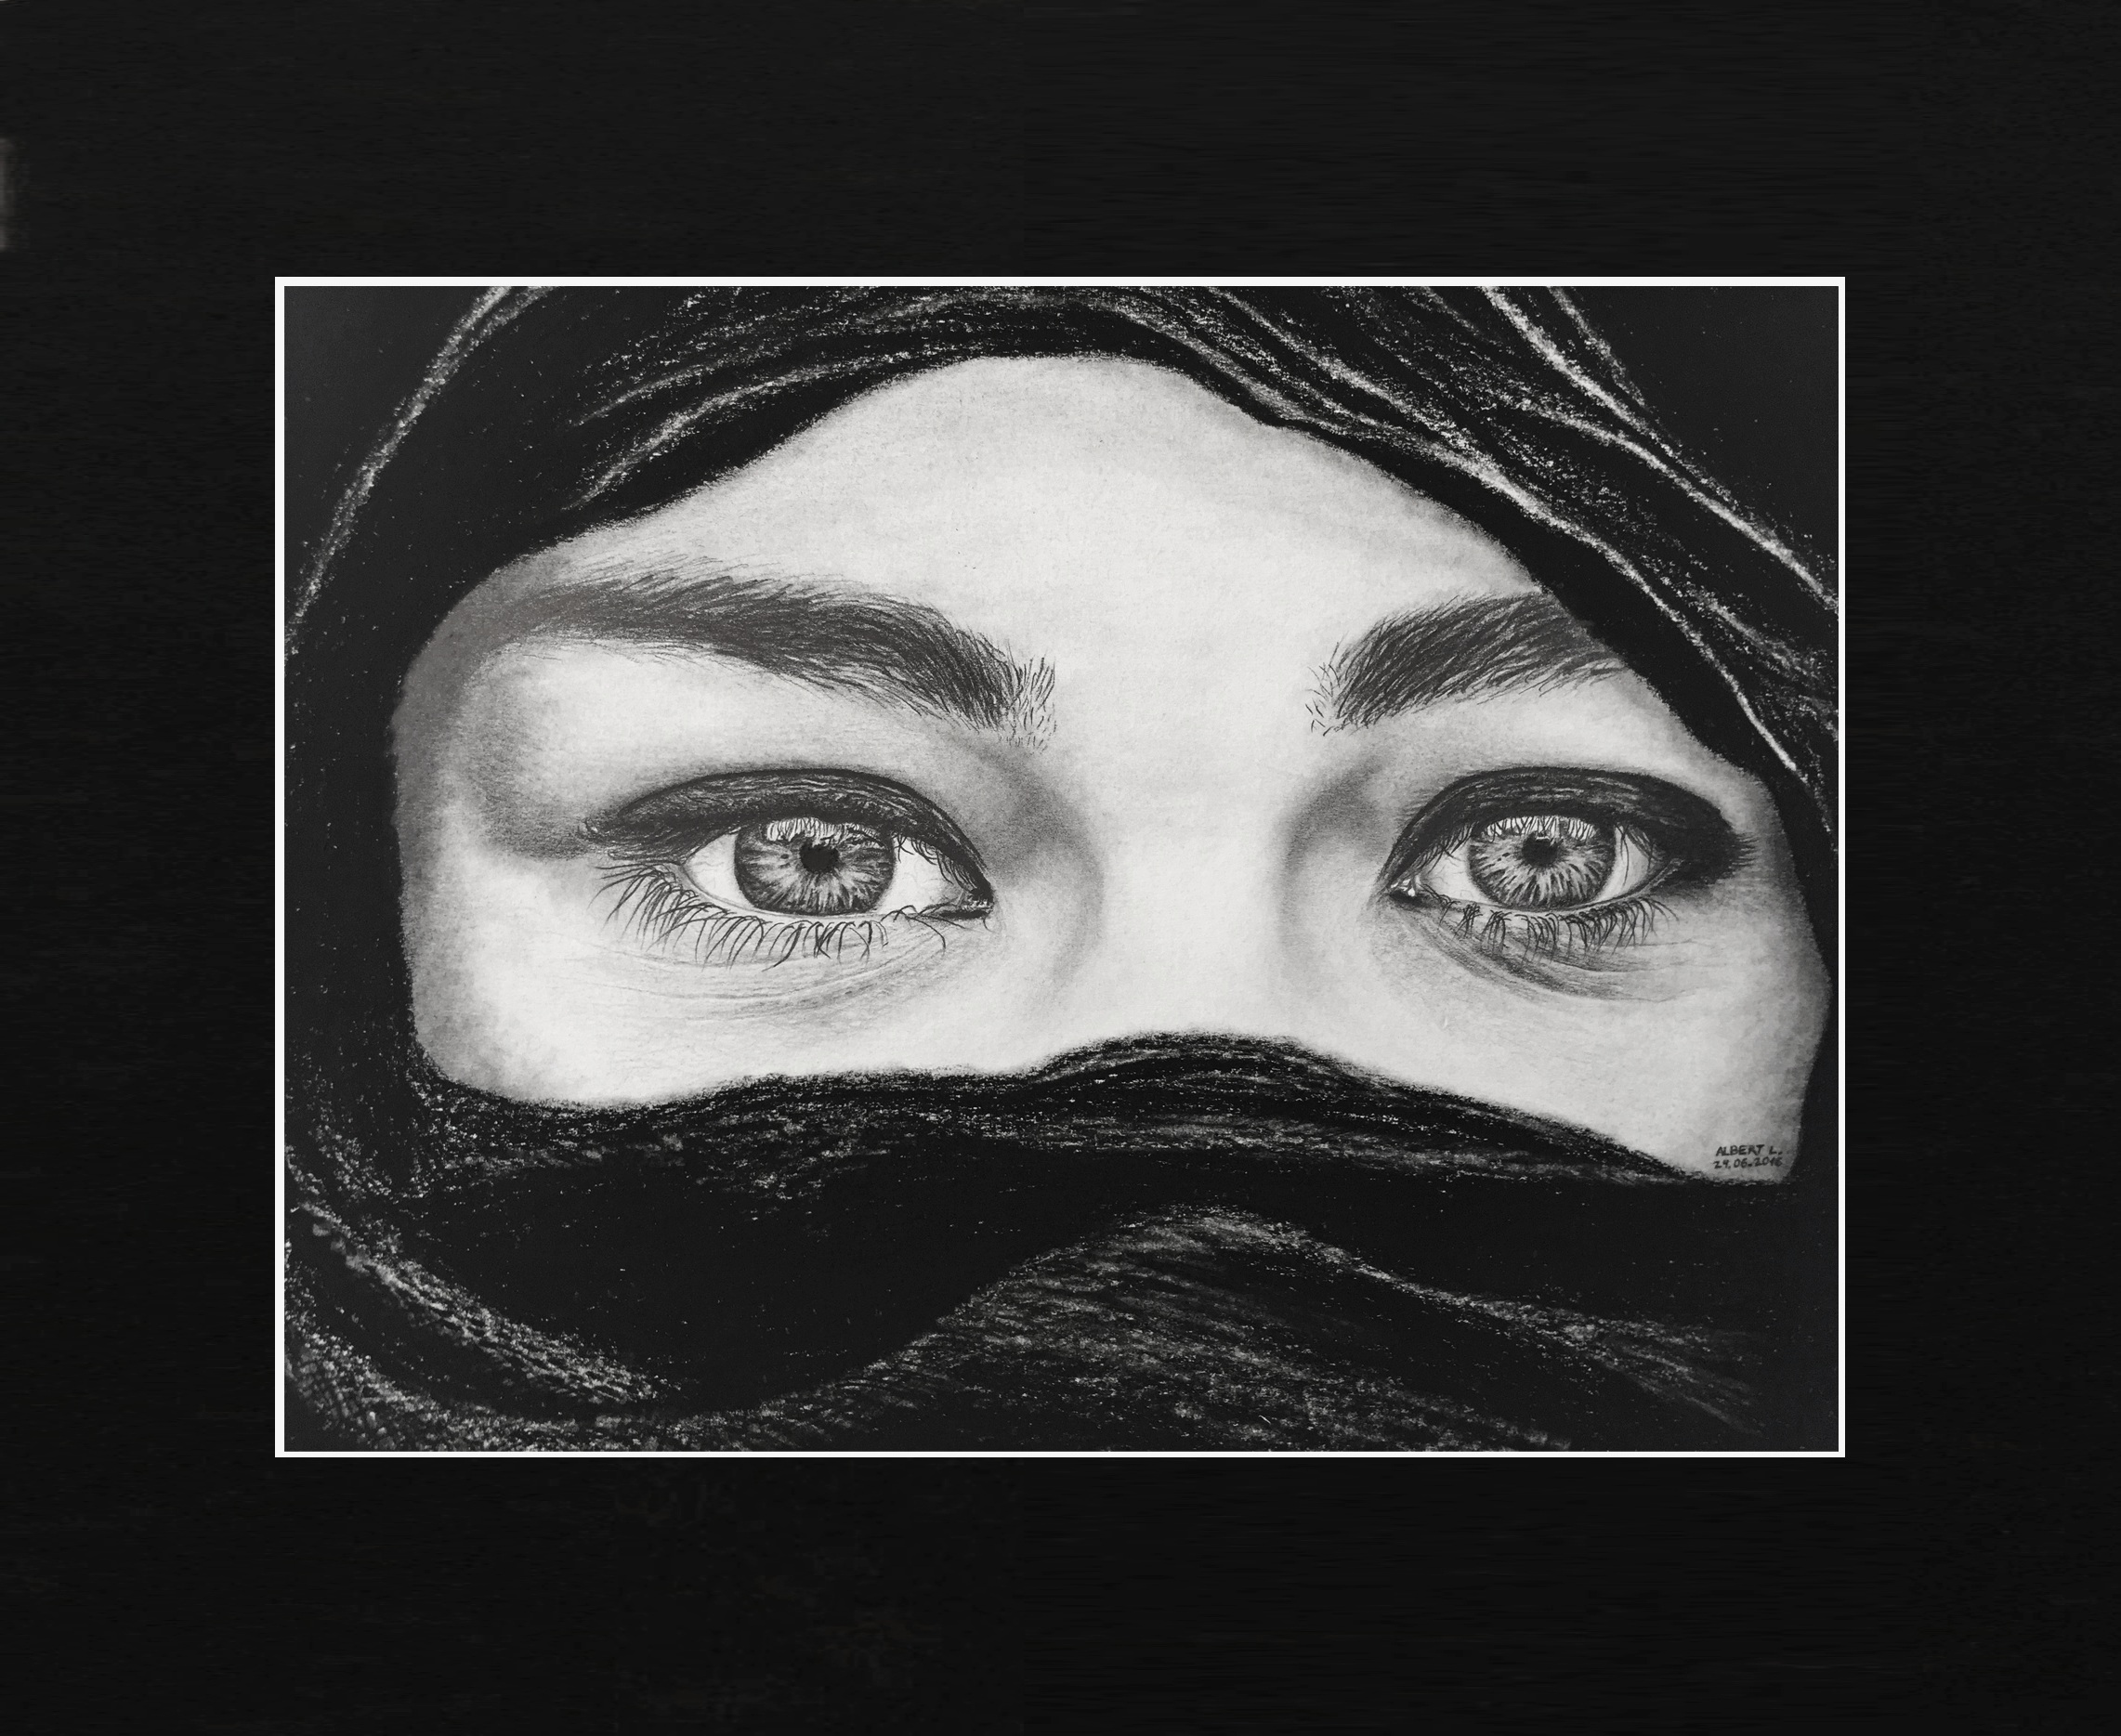 Mujer con velo - 24/06/2016